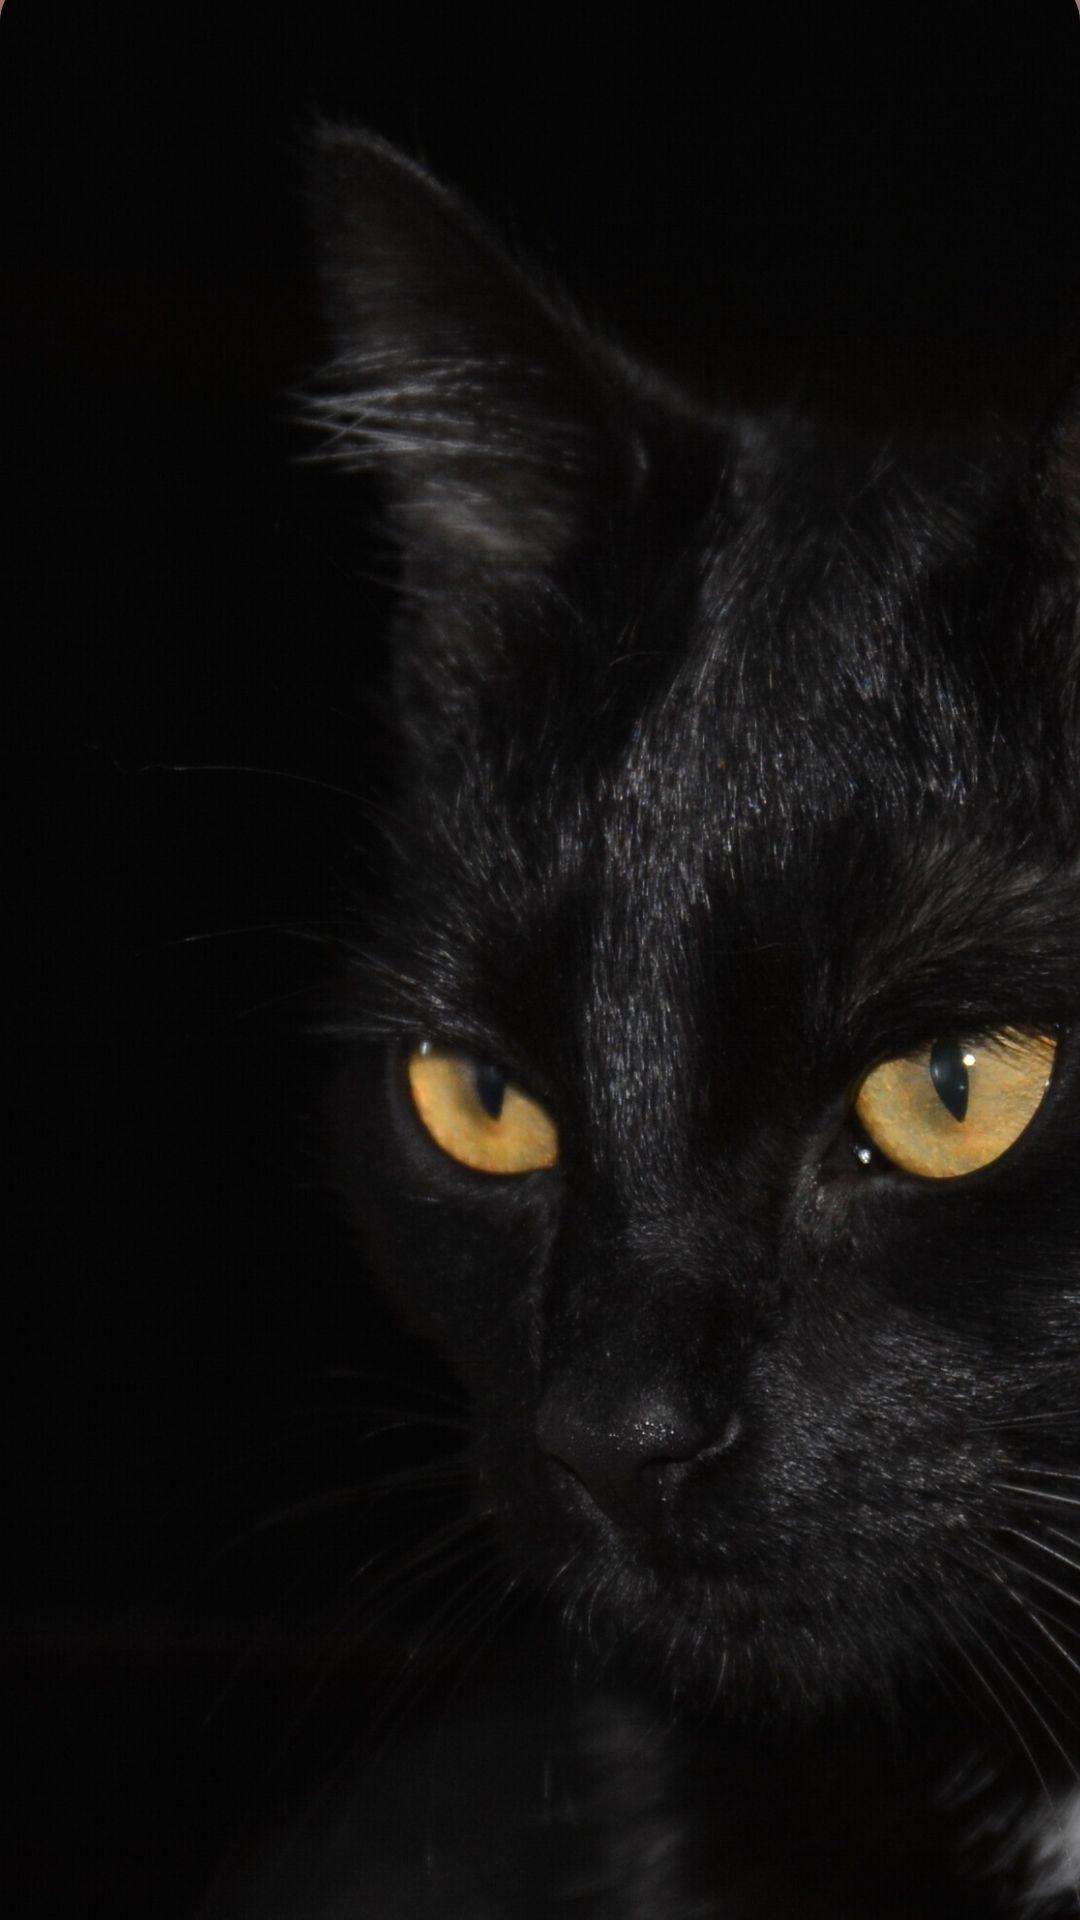 Iphone Black Cat Wallpaper In 2020 Cat Wallpaper Cat Aesthetic Cute Cat Wallpaper